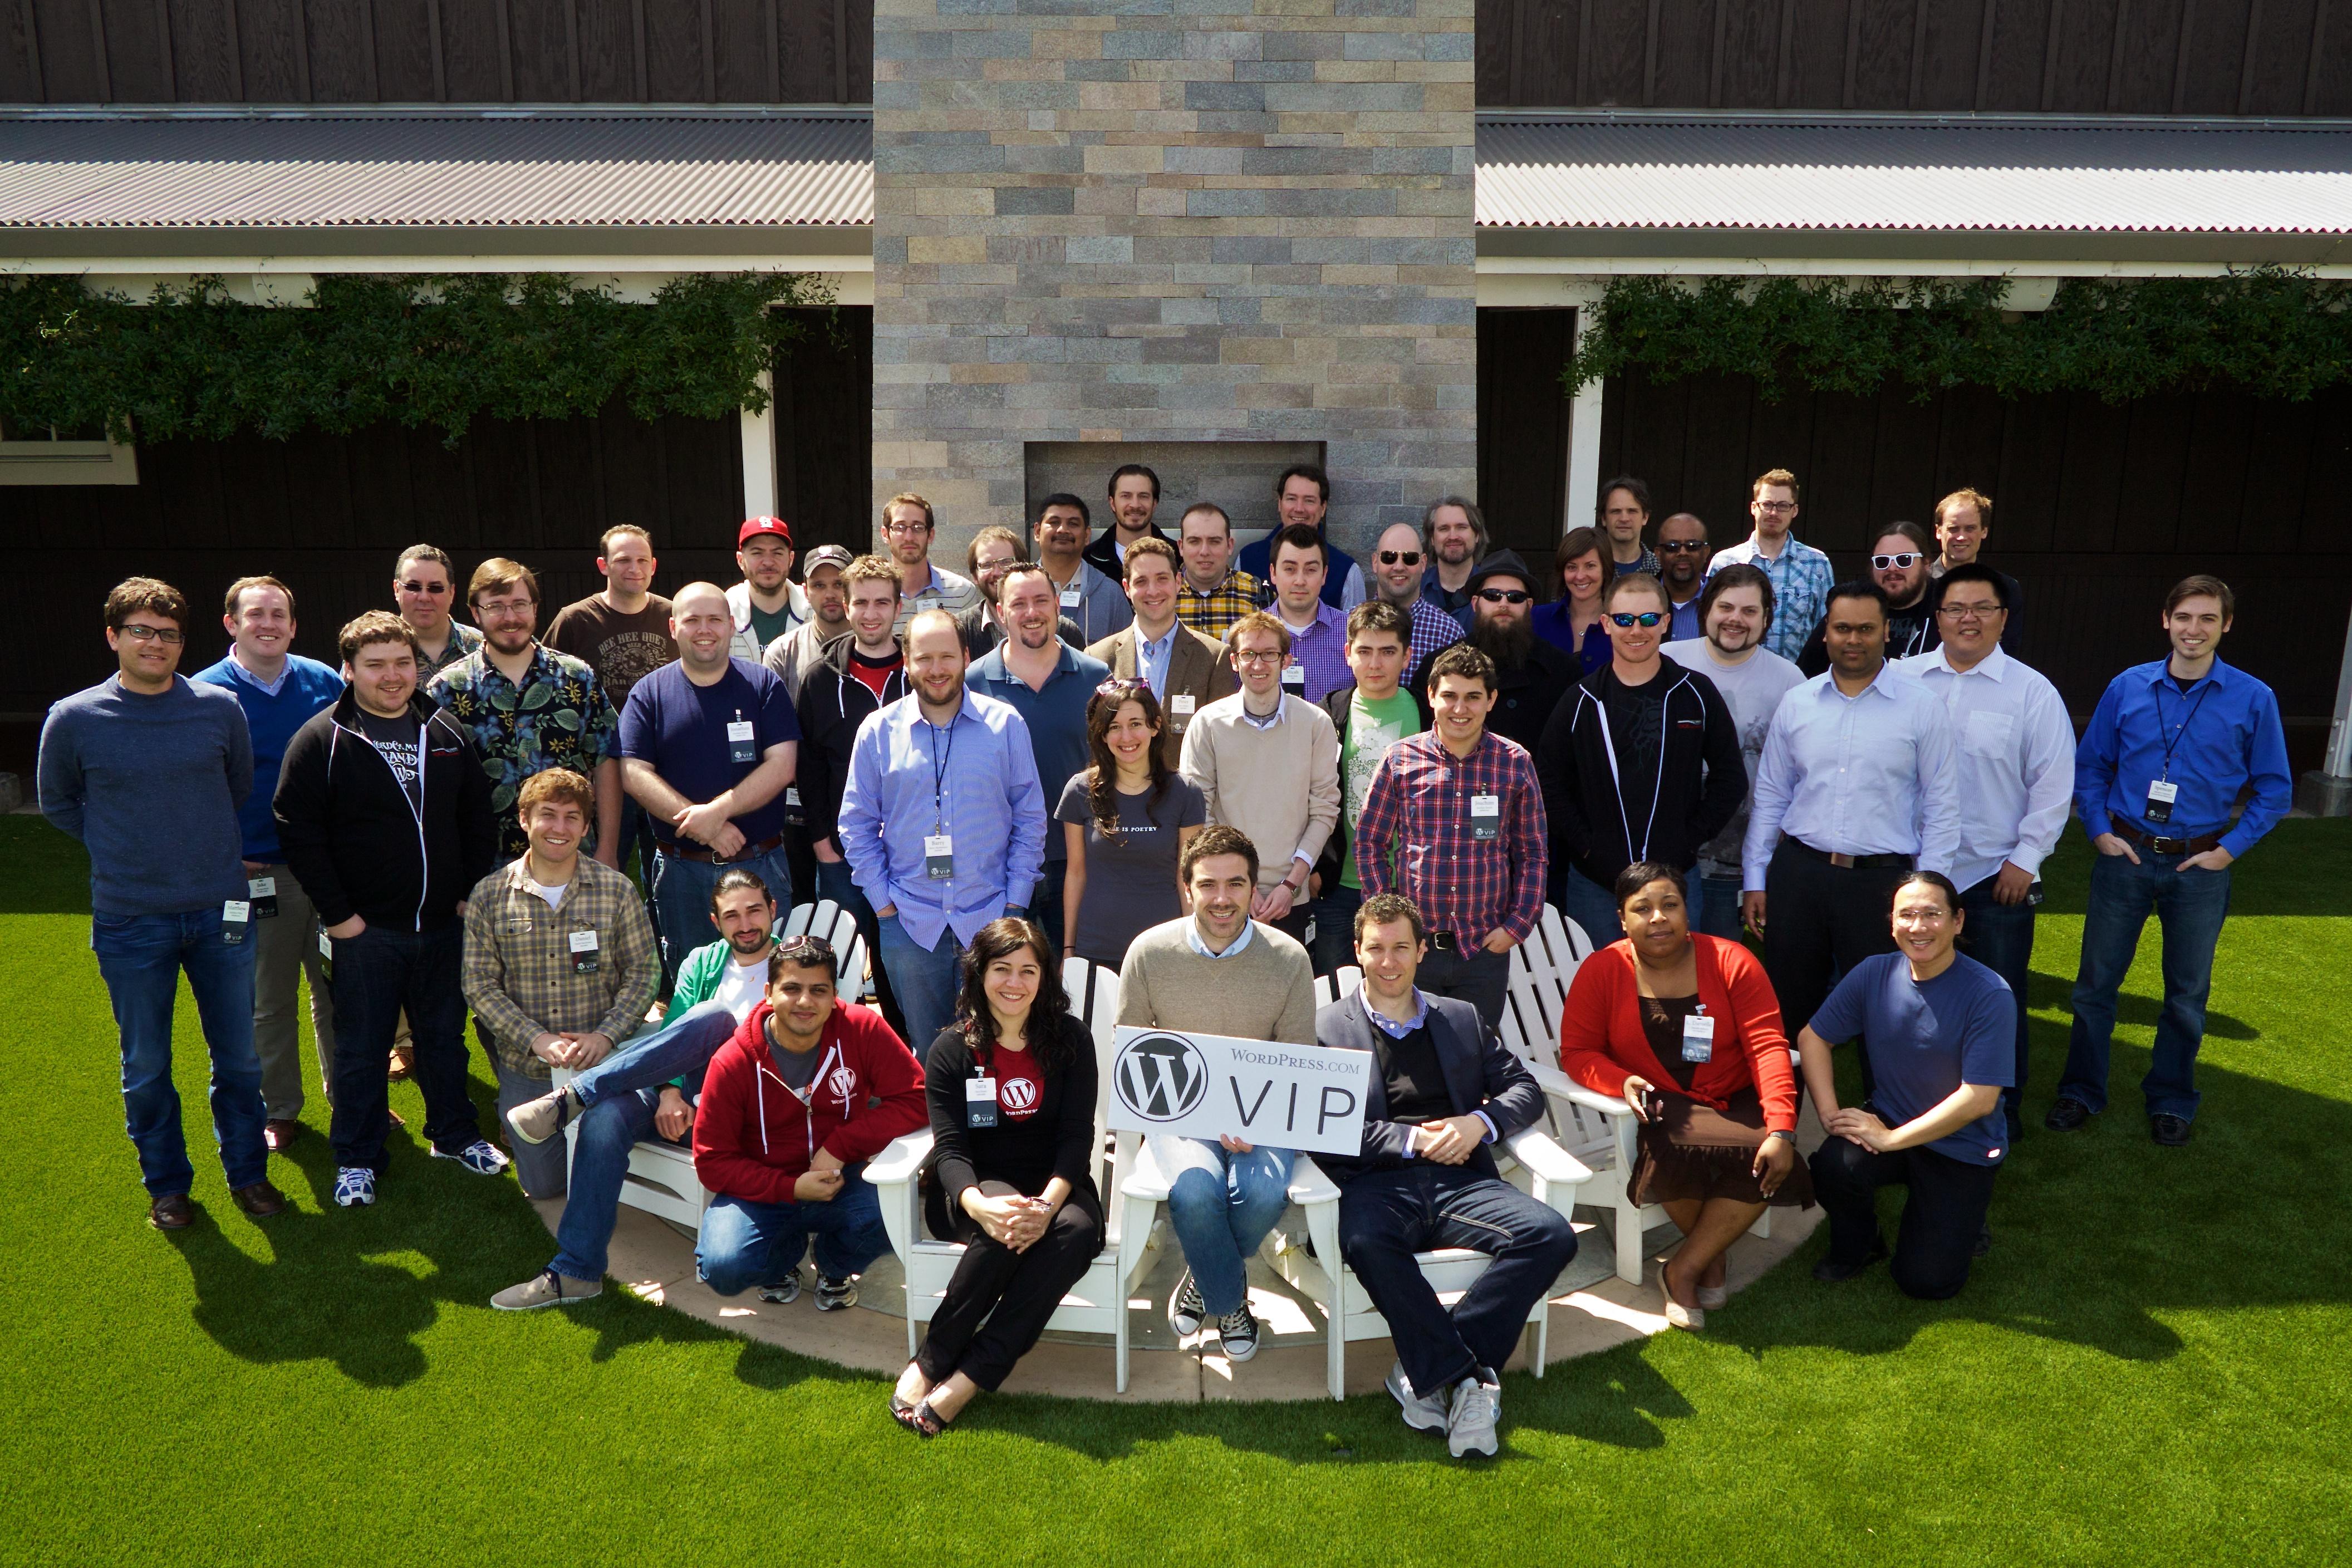 WordPress.com VIP Workshop Group Photo